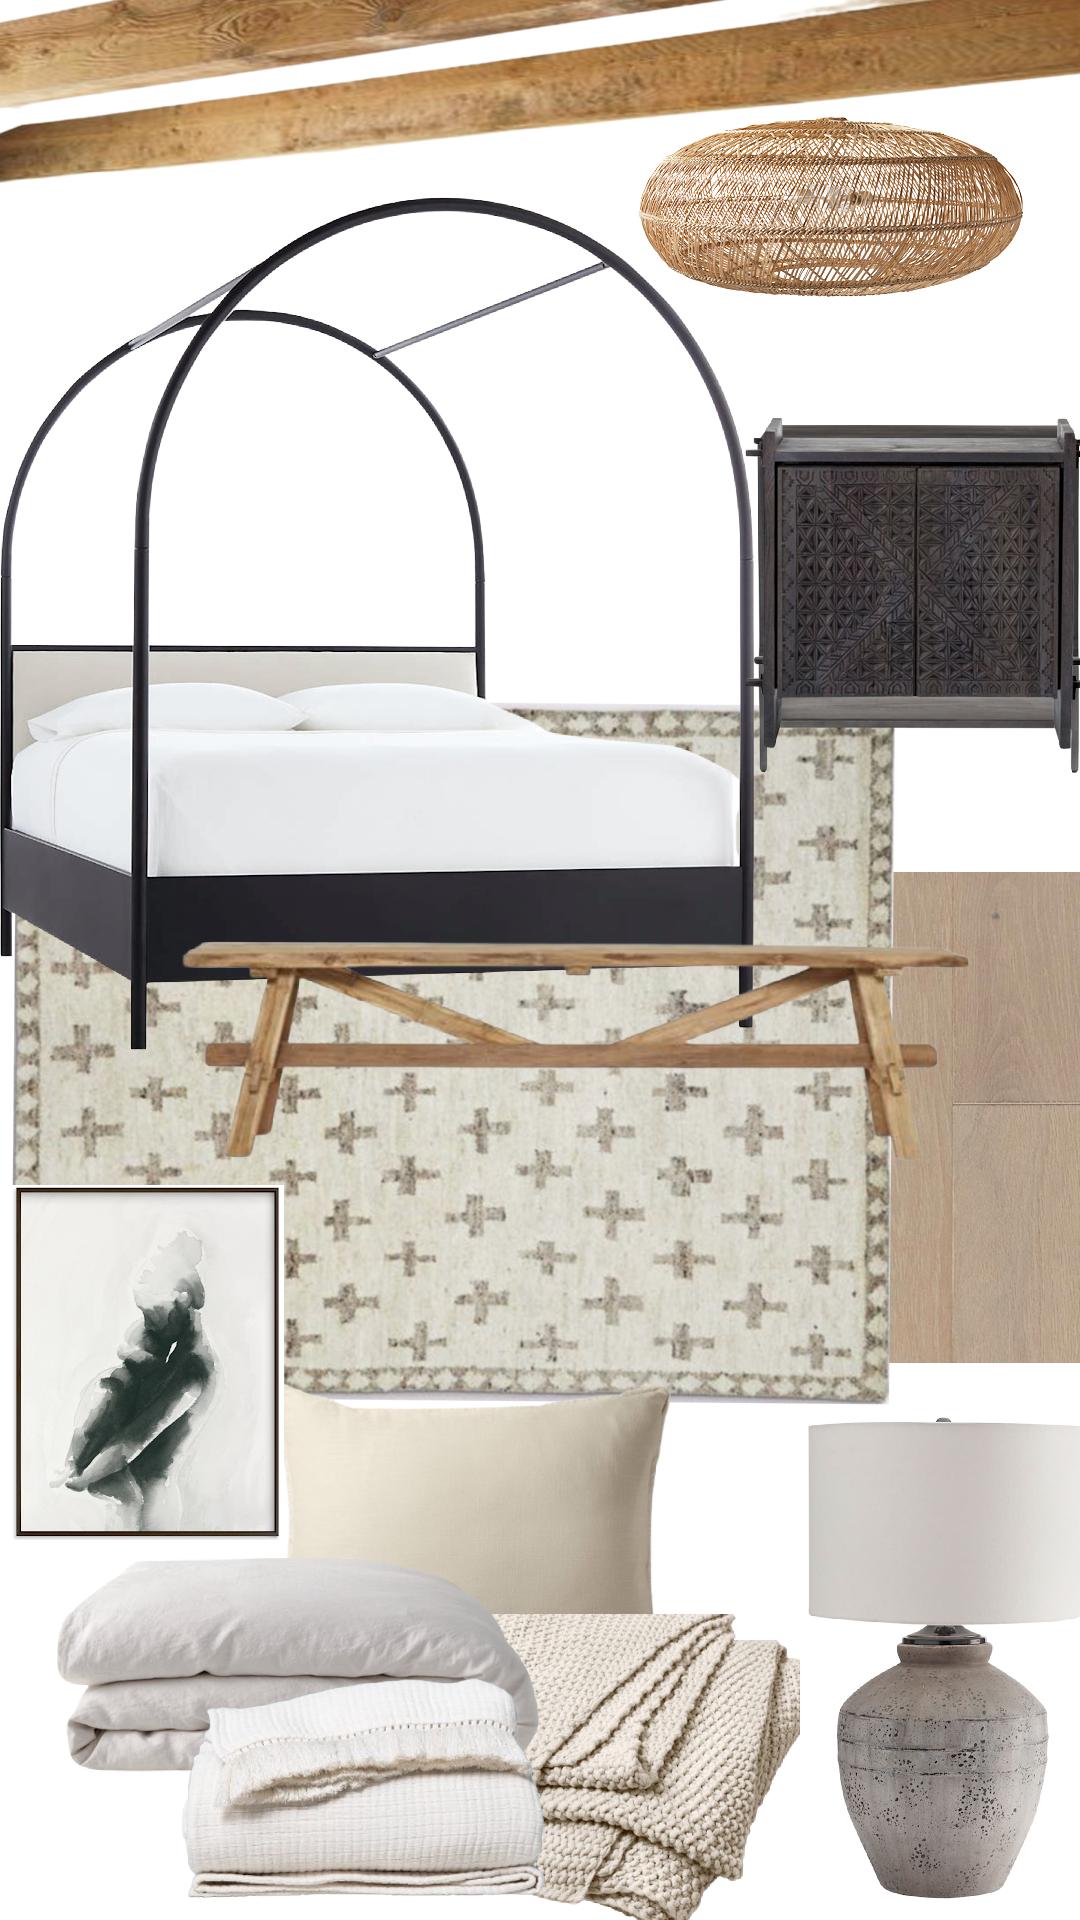 Primary Bedroom Plans